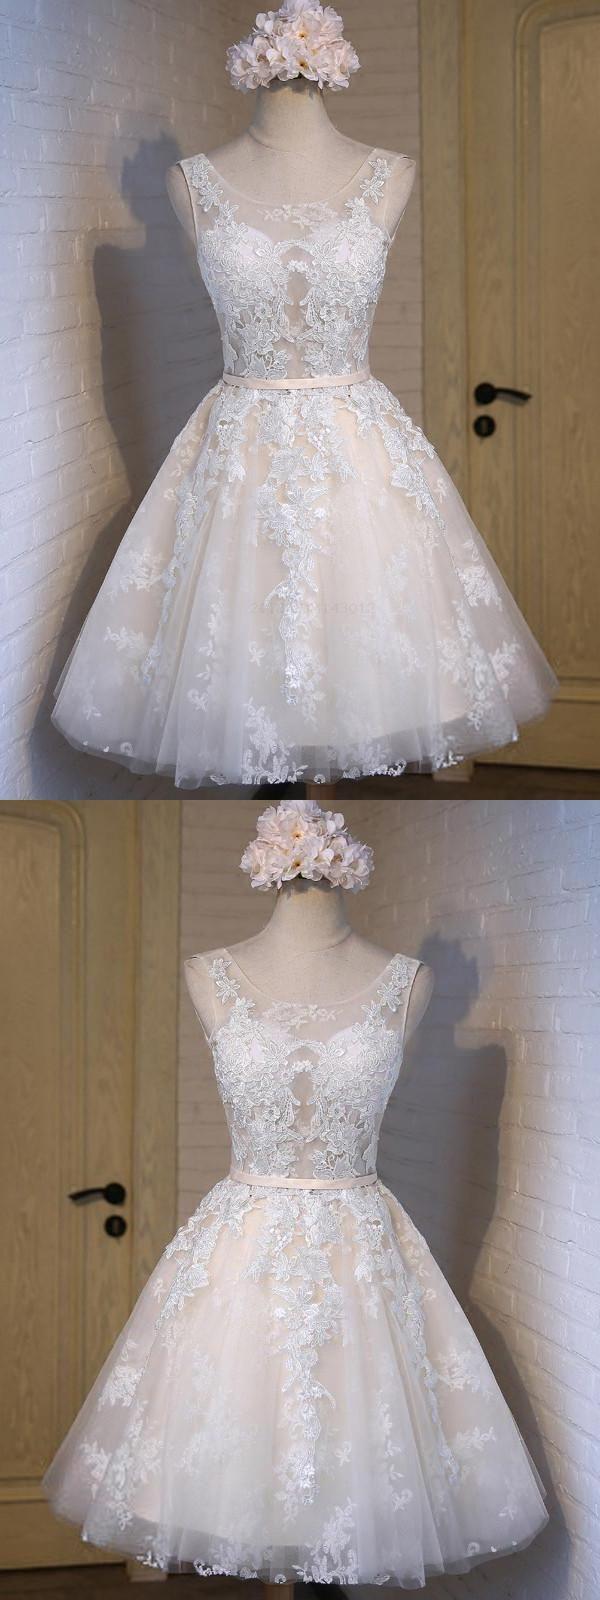 Prom dresses aline prom dresses short homecoming dresses cheap